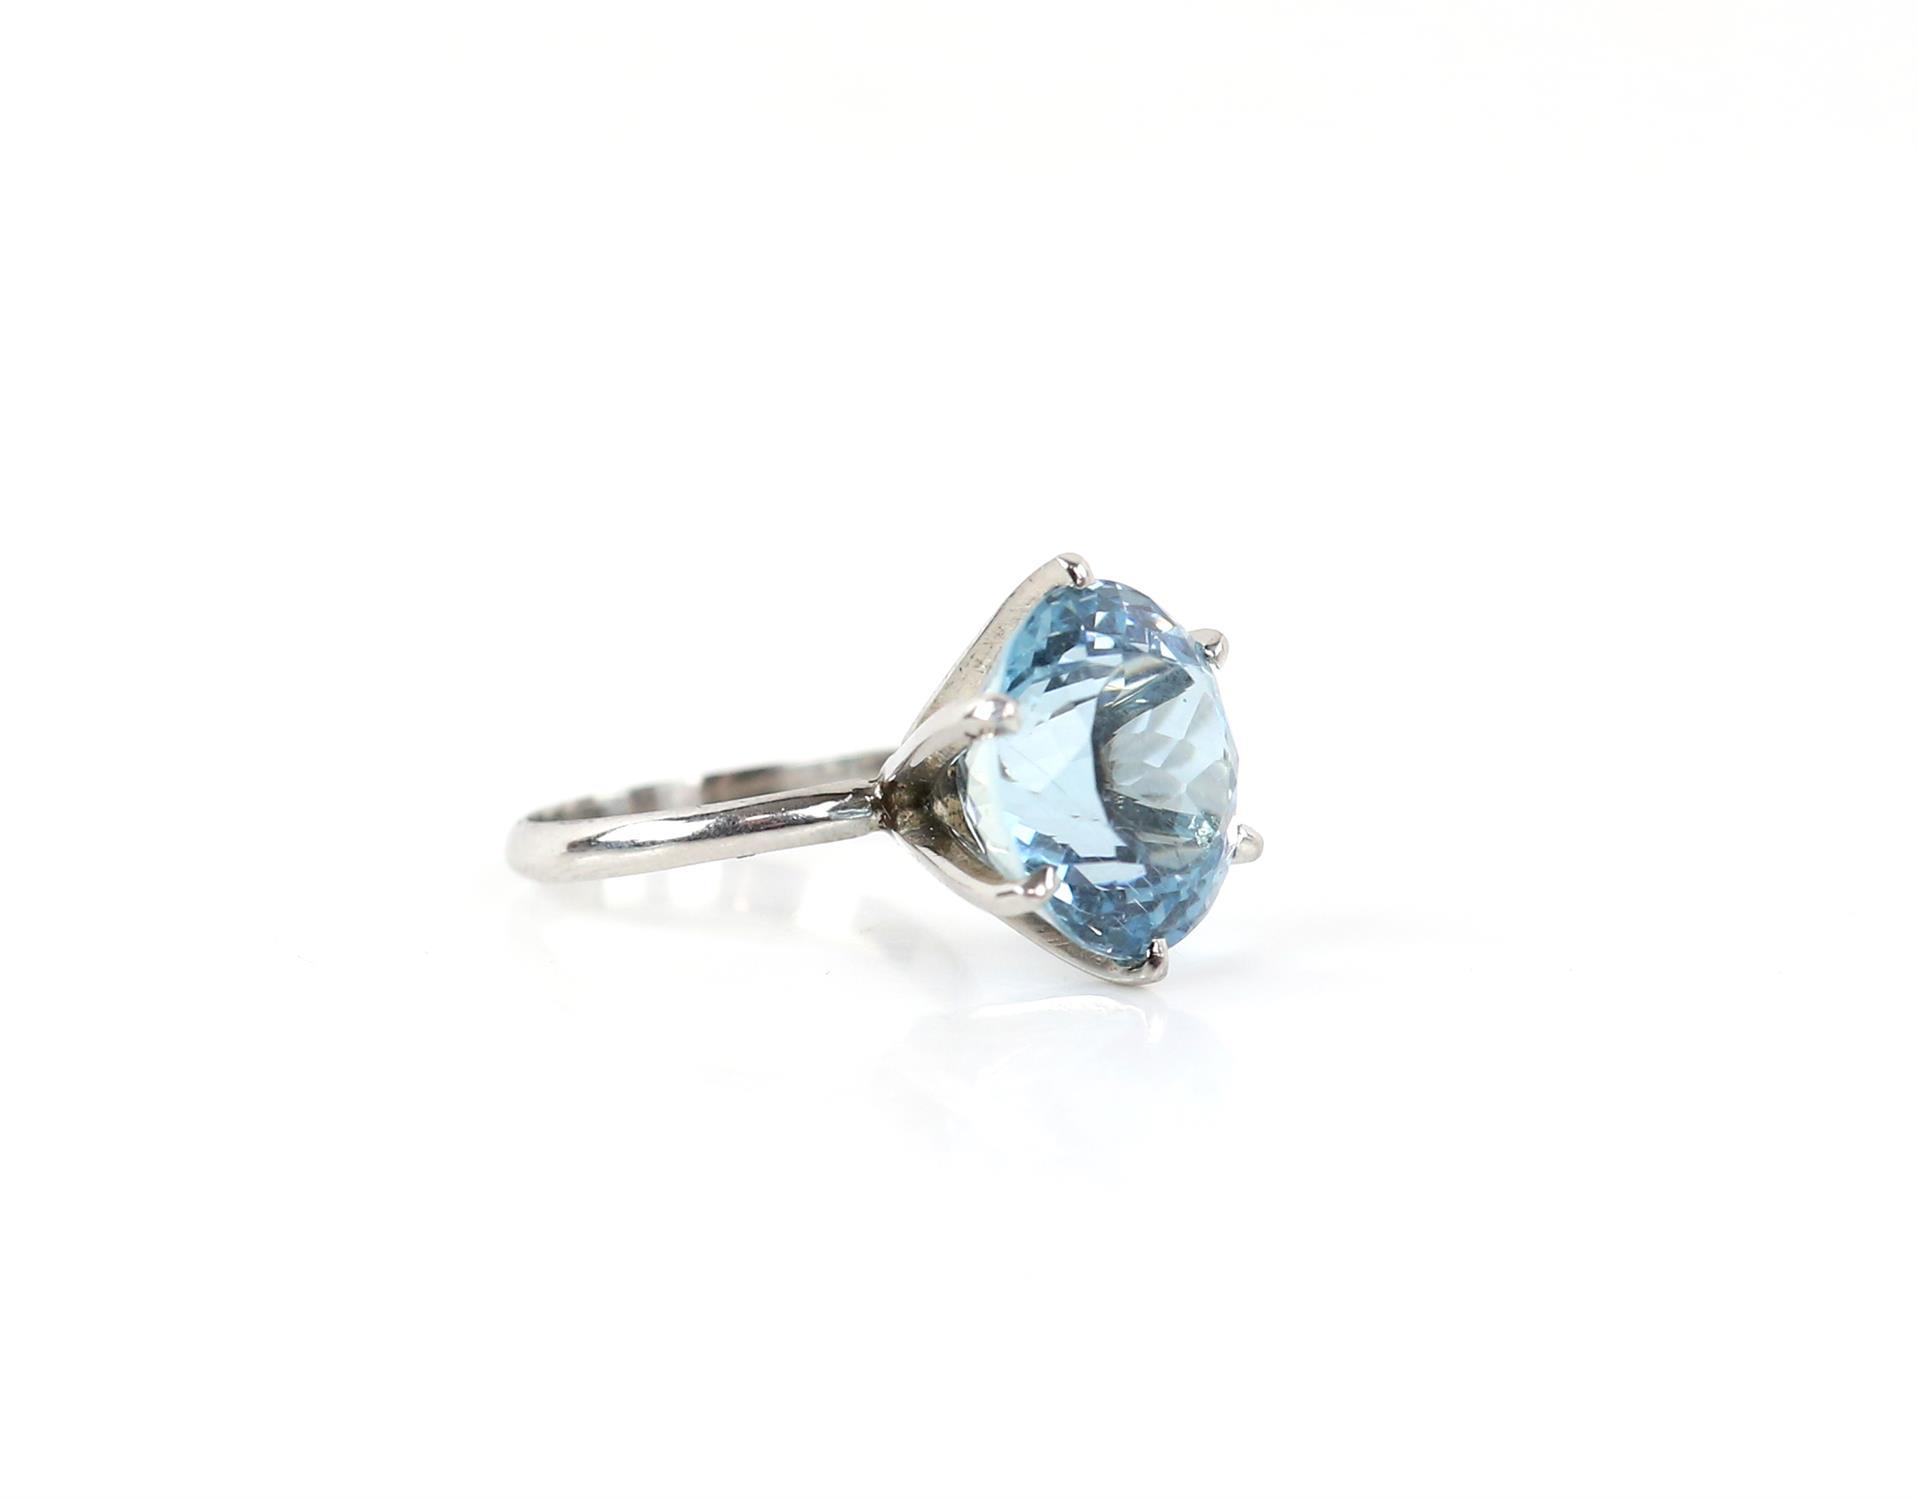 Aquamarine ring, round cut aquamarine, estimated weight 8.80 carats, mount testing as 18 ct, - Image 9 of 9